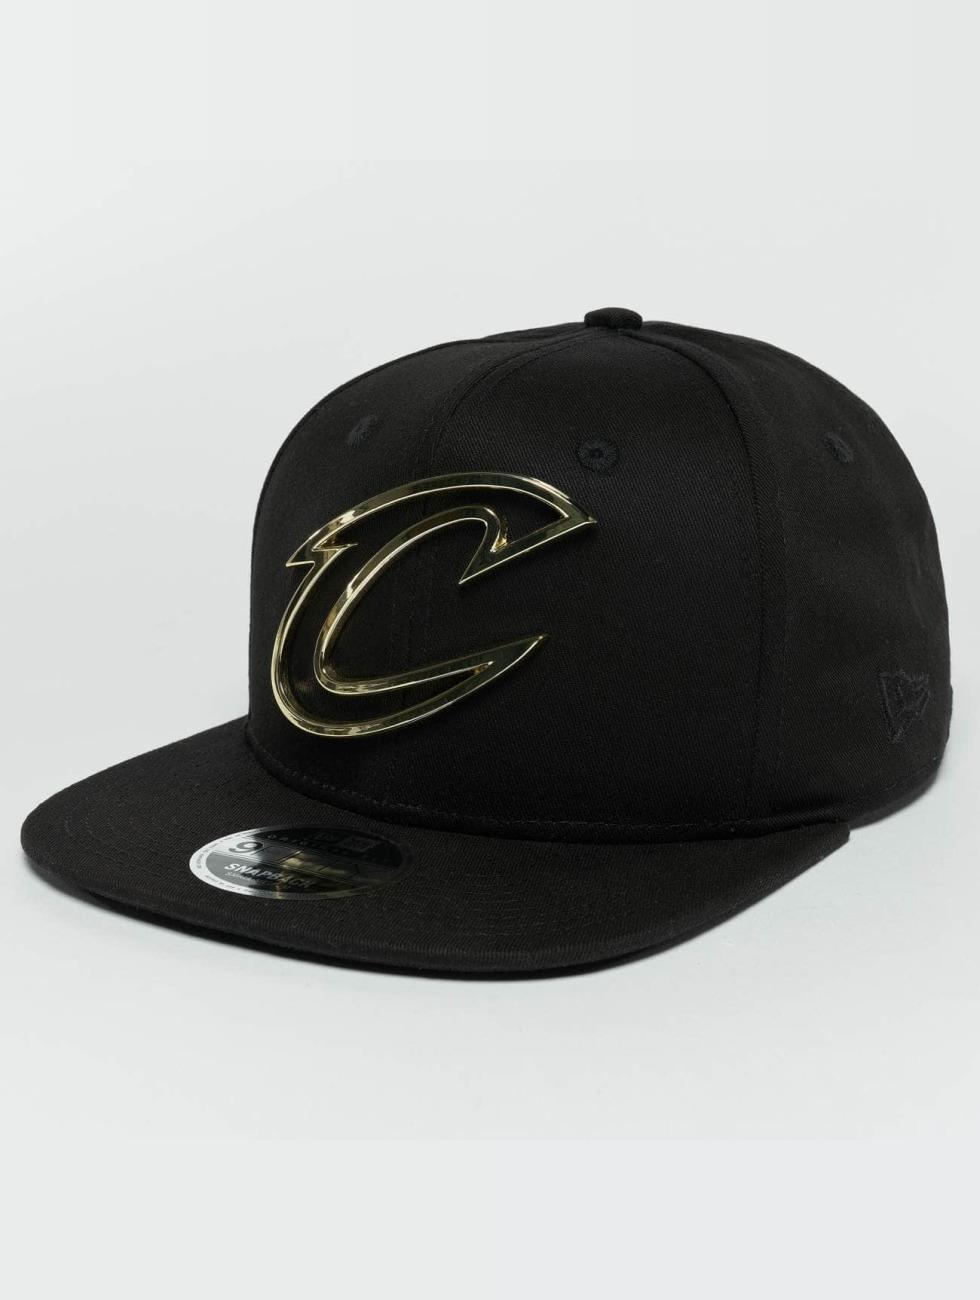 New Era Casquette Snapback & Strapback Metal Badge Cleveland Cavaliers noir